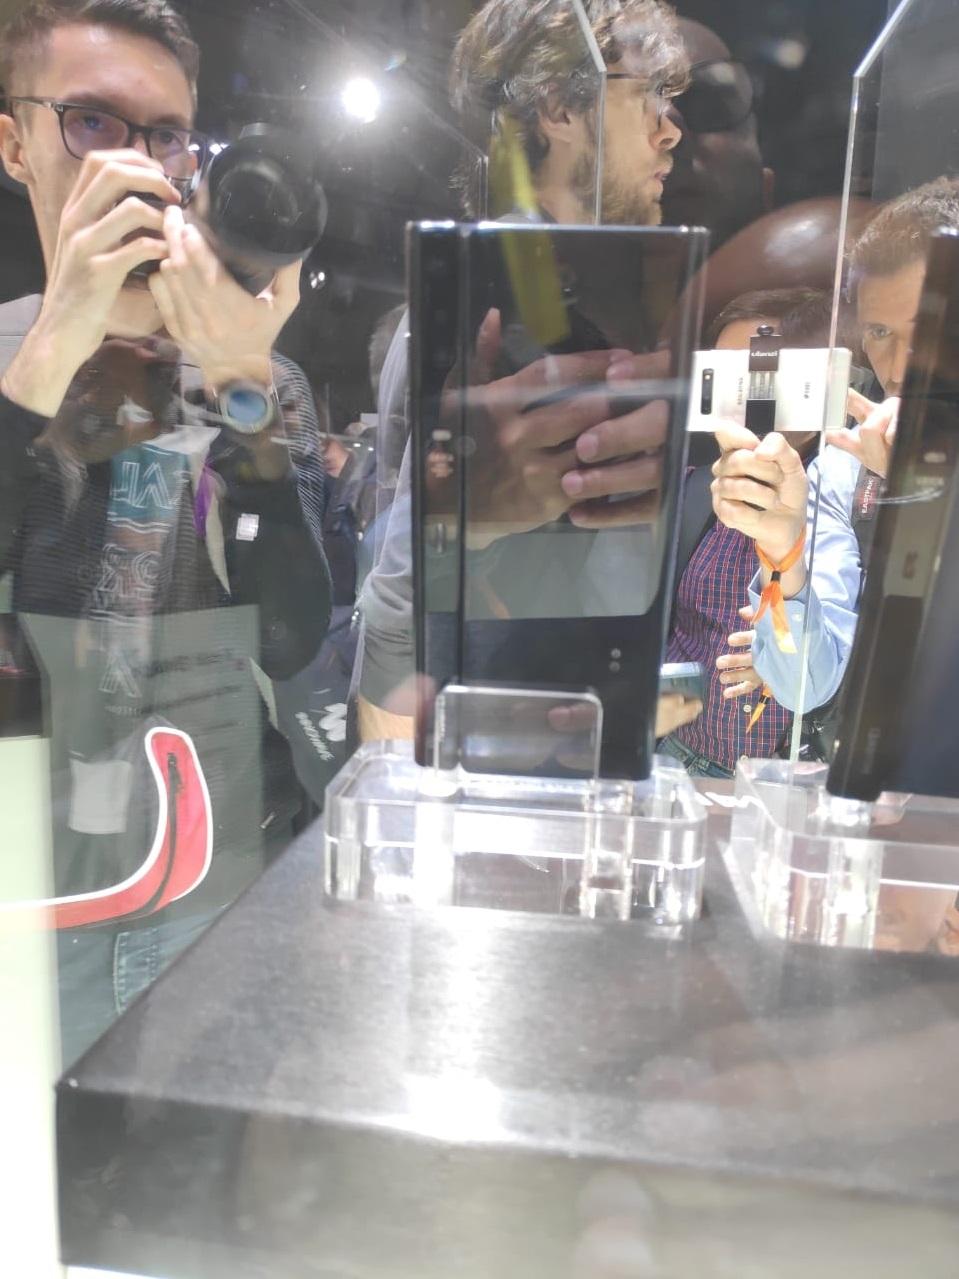 Huawei, Mate X, 5G smartphone, Chinese technology, Gadget news, Technology news